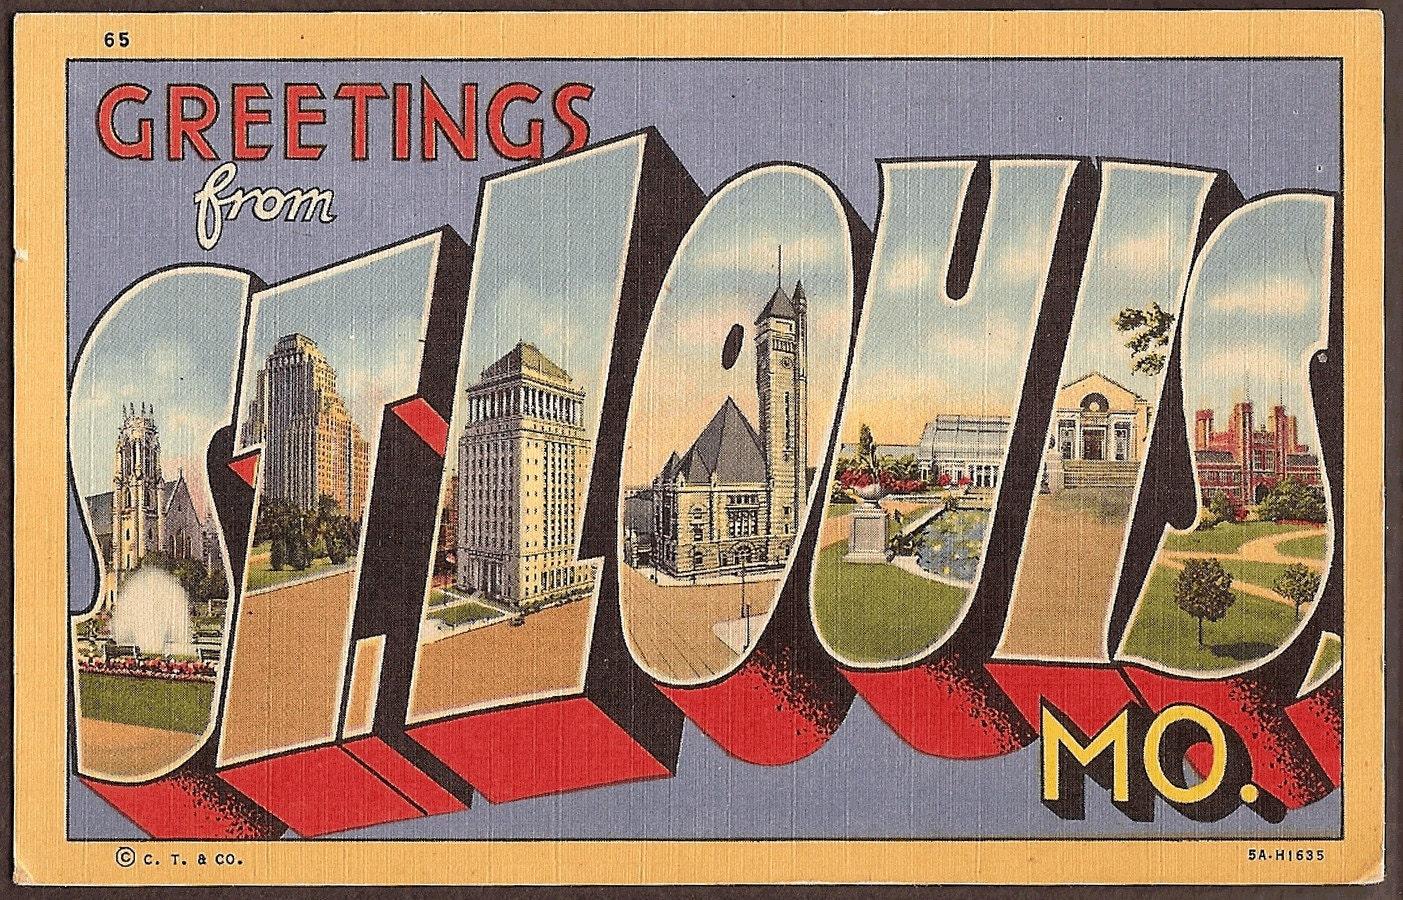 Vintage Postcards Greetings From 18